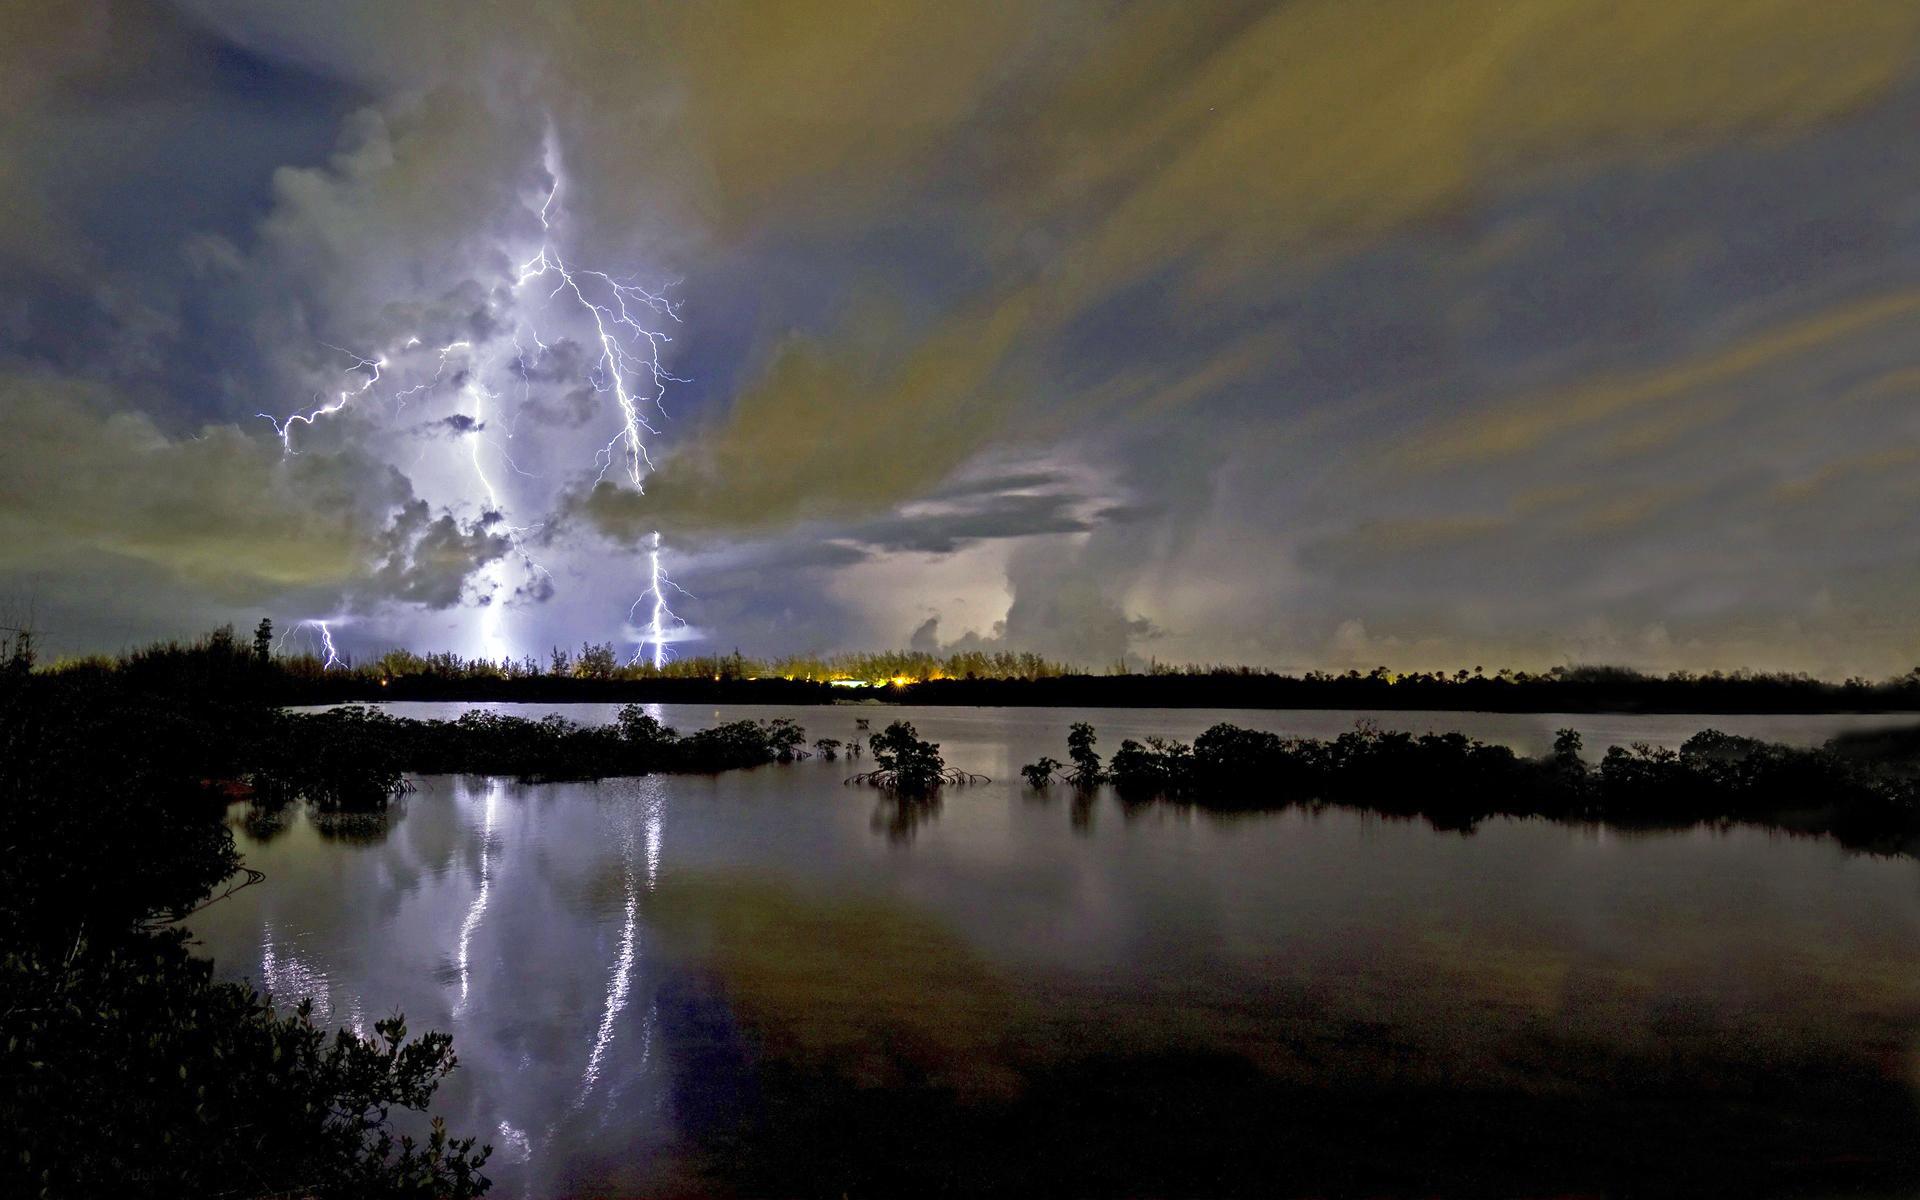 вода, вечер, молния